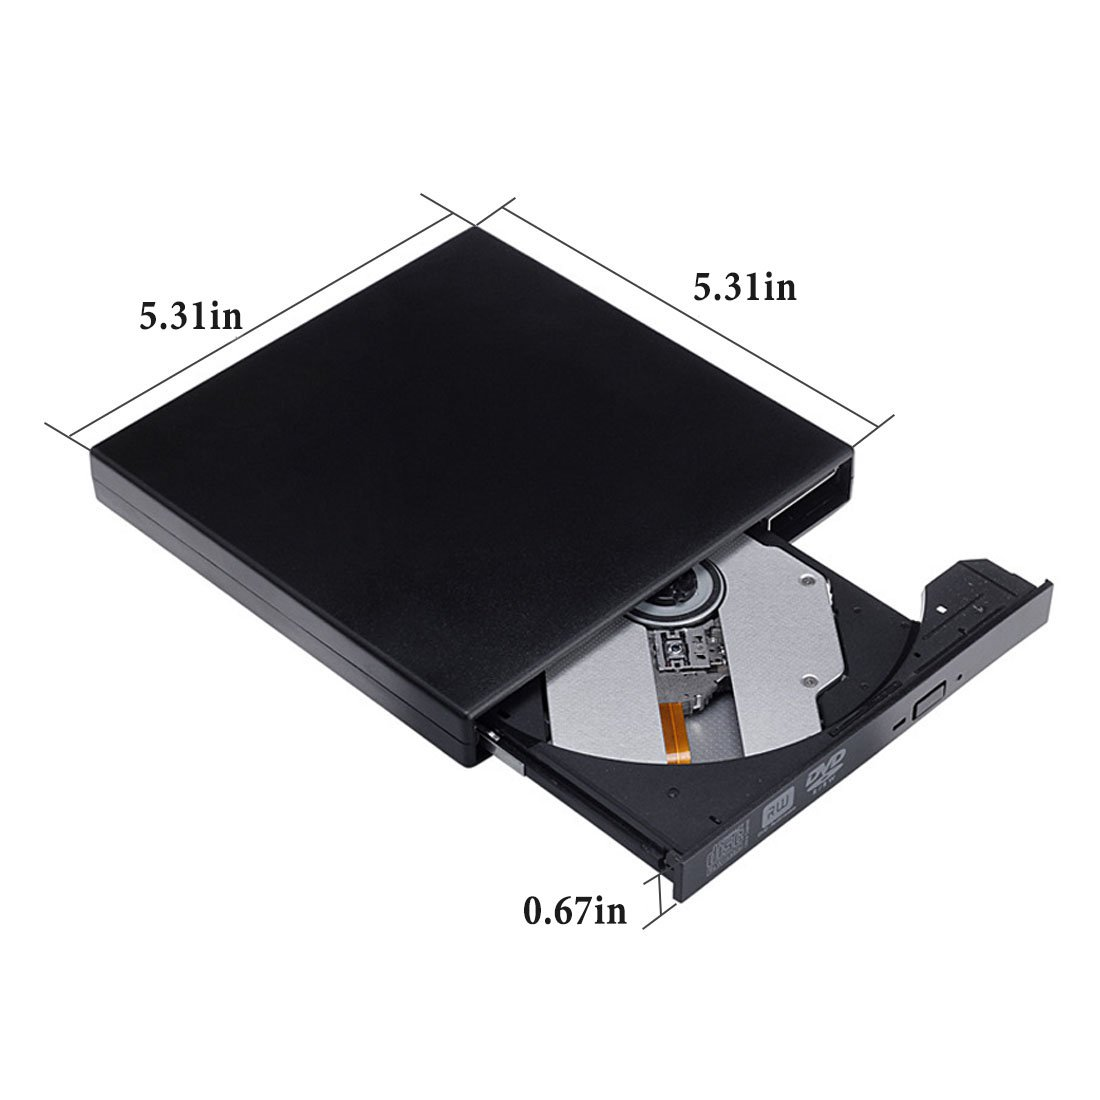 External CD DVD Drive, Sunreal External Optical Drive USB 2.0 DVD/CD Player Portable Slim High Speed Data Transfer DVD Drive for PC Computer Laptop Desktops with Windows Mac OS(Black) by Sunreal (Image #4)